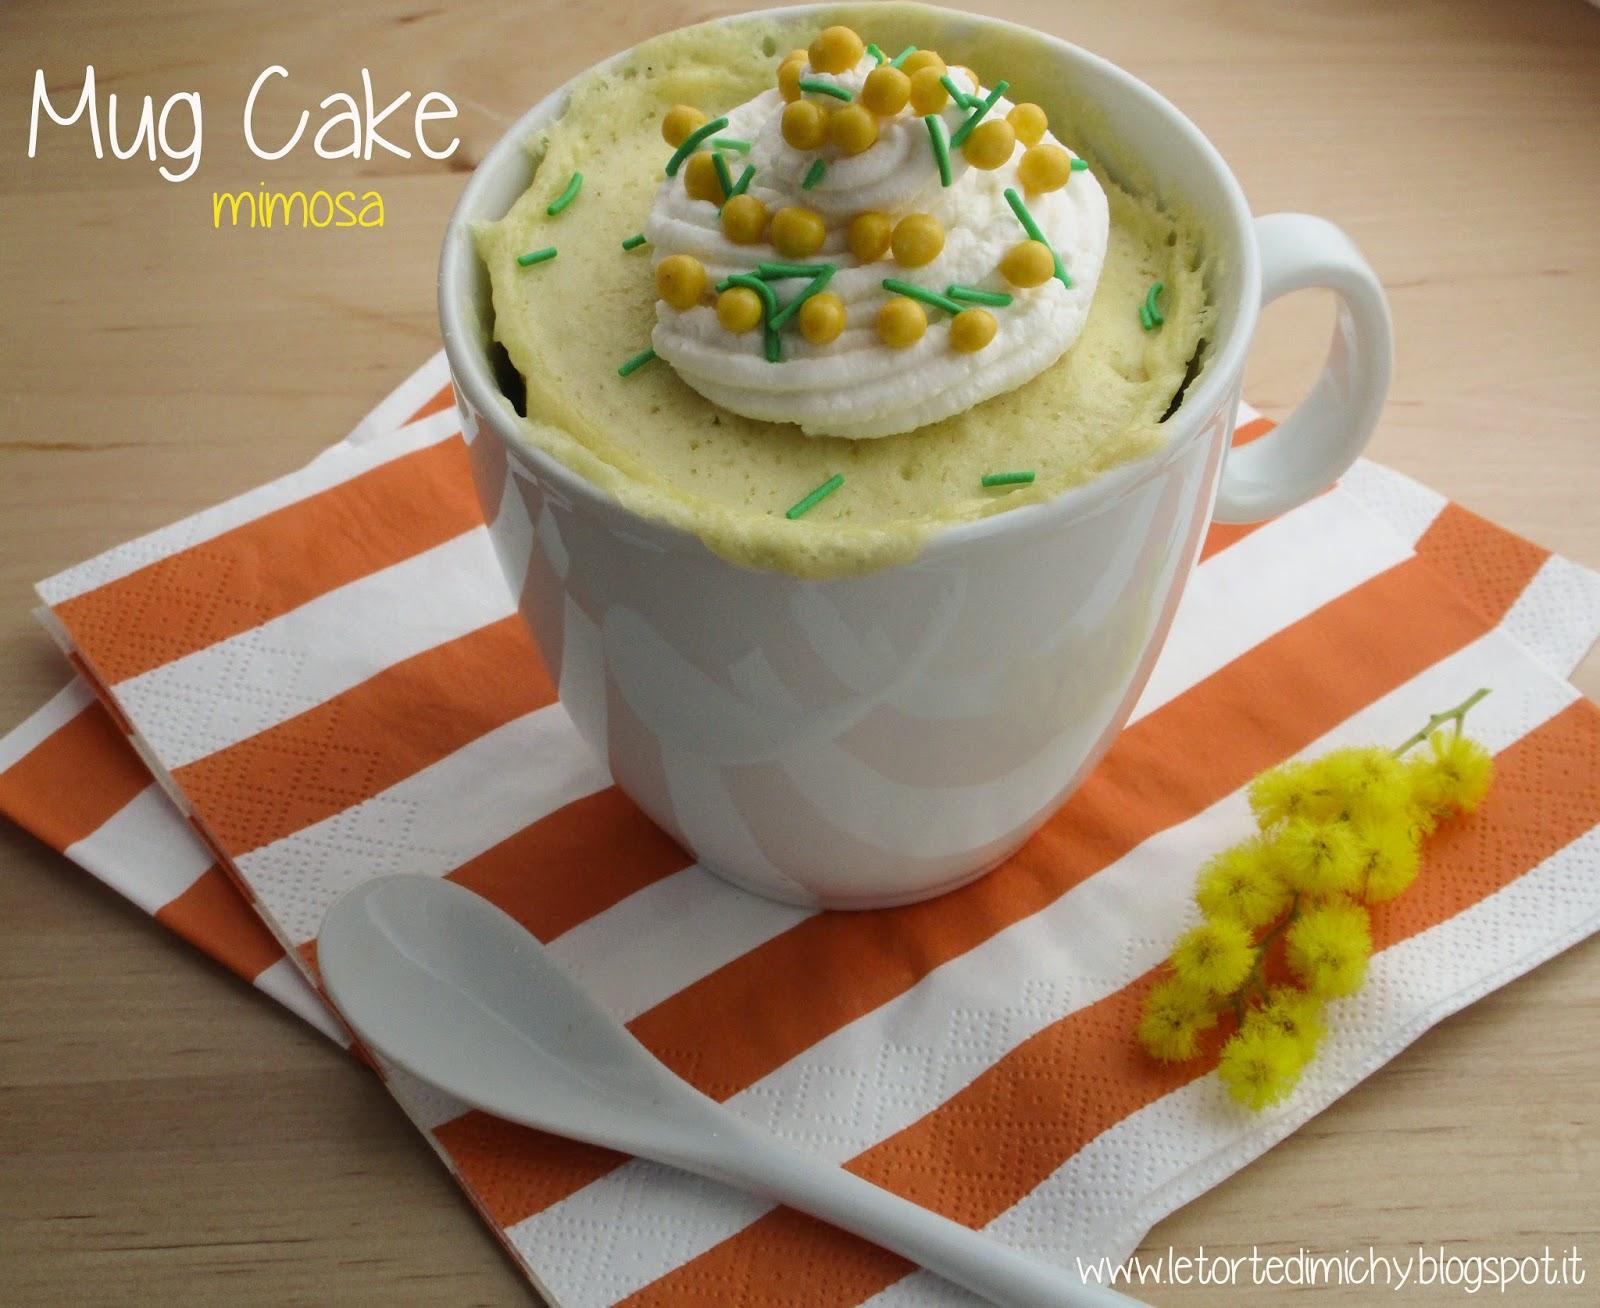 mimosa mug cake (torta in tazza mimosa)